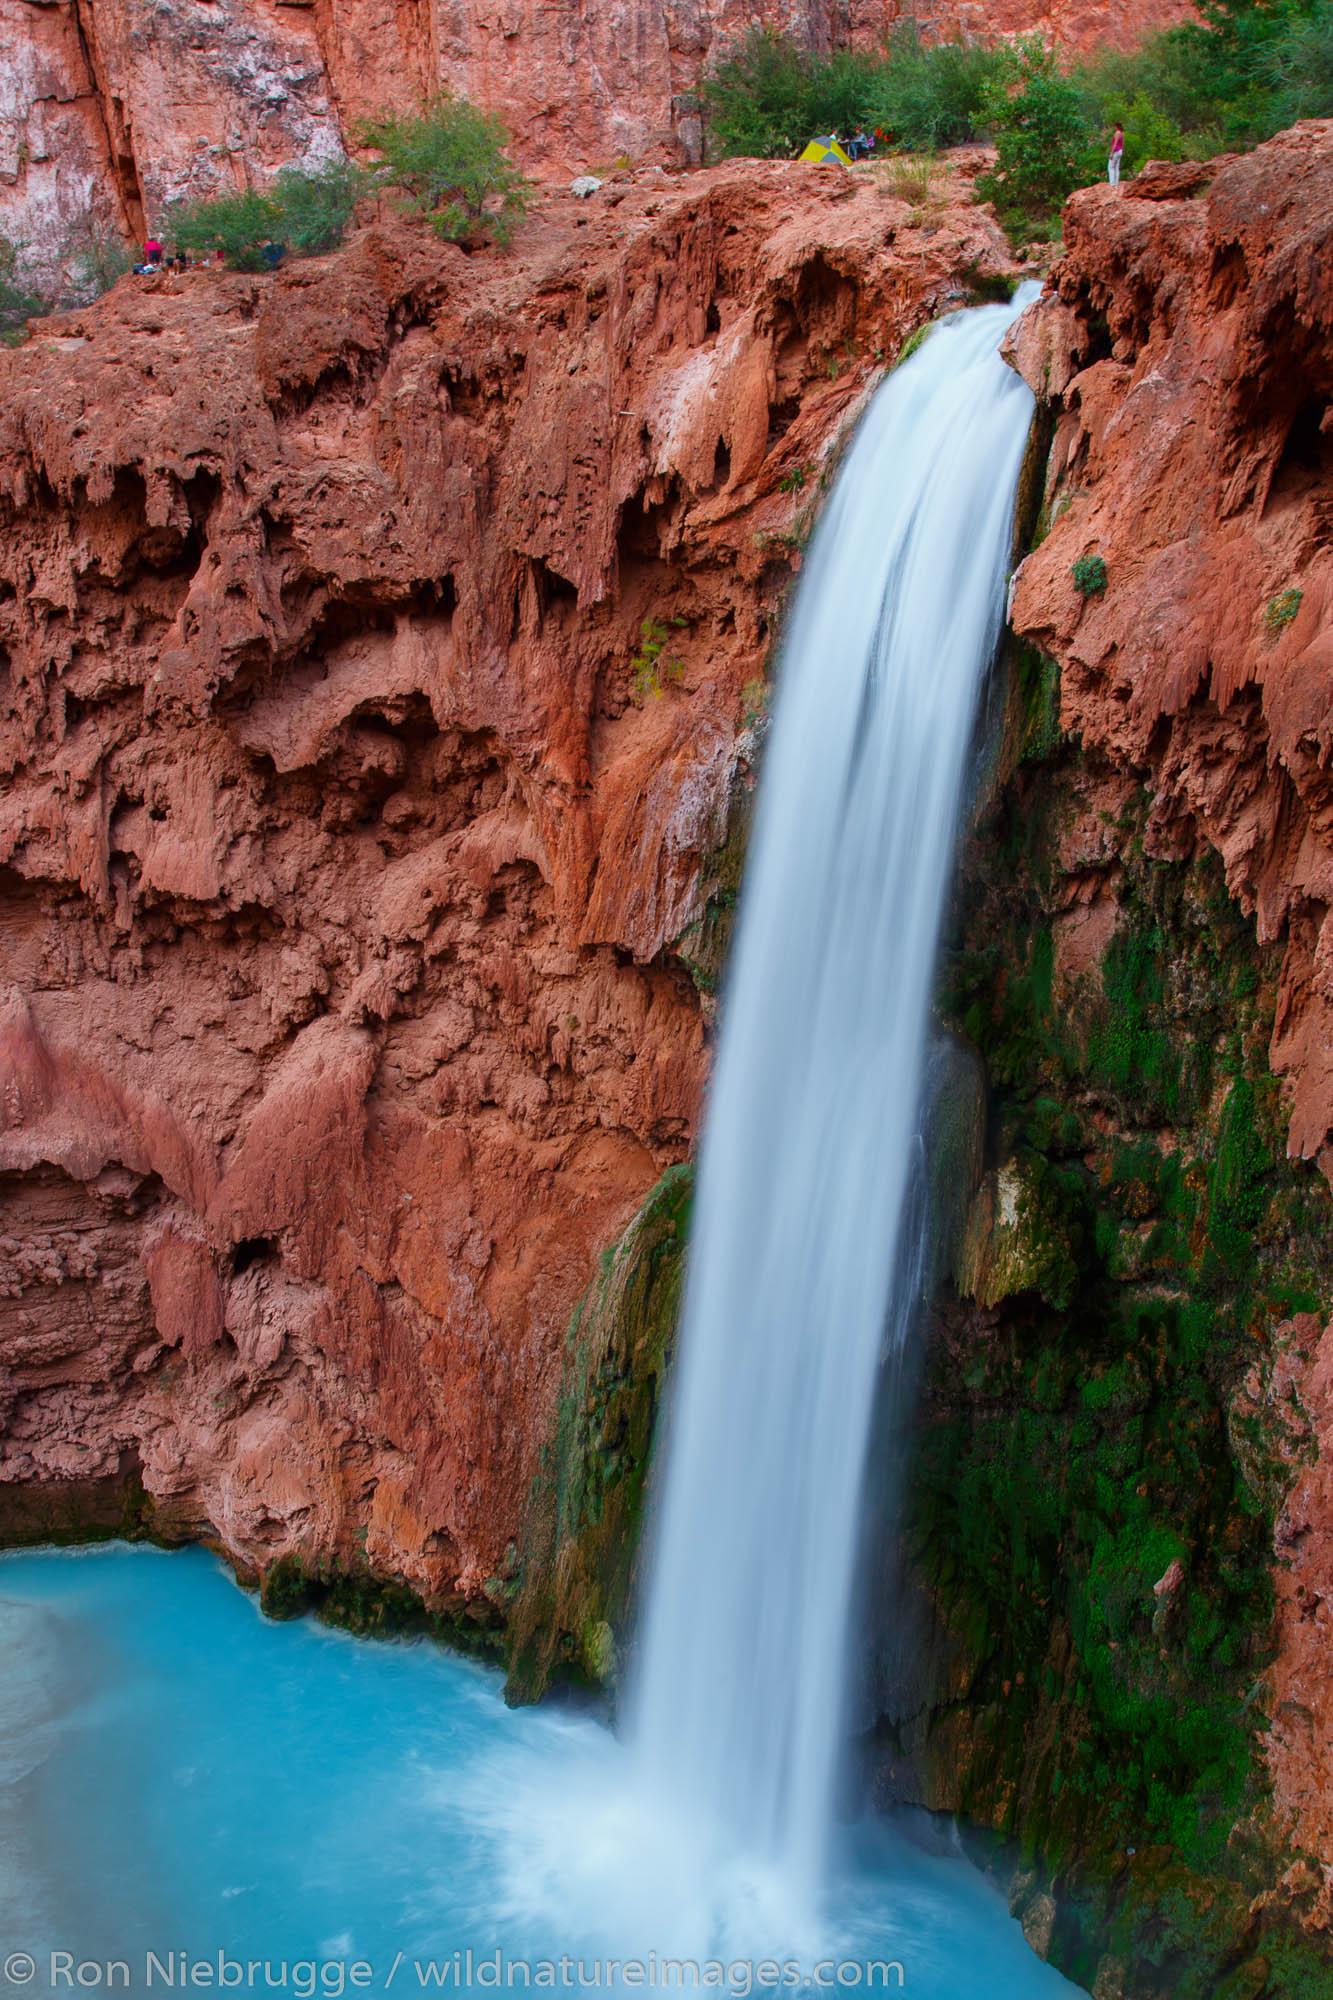 Hiker at Mooney Falls, Havasupai Indian Reservation, Grand Canyon, Arizona.